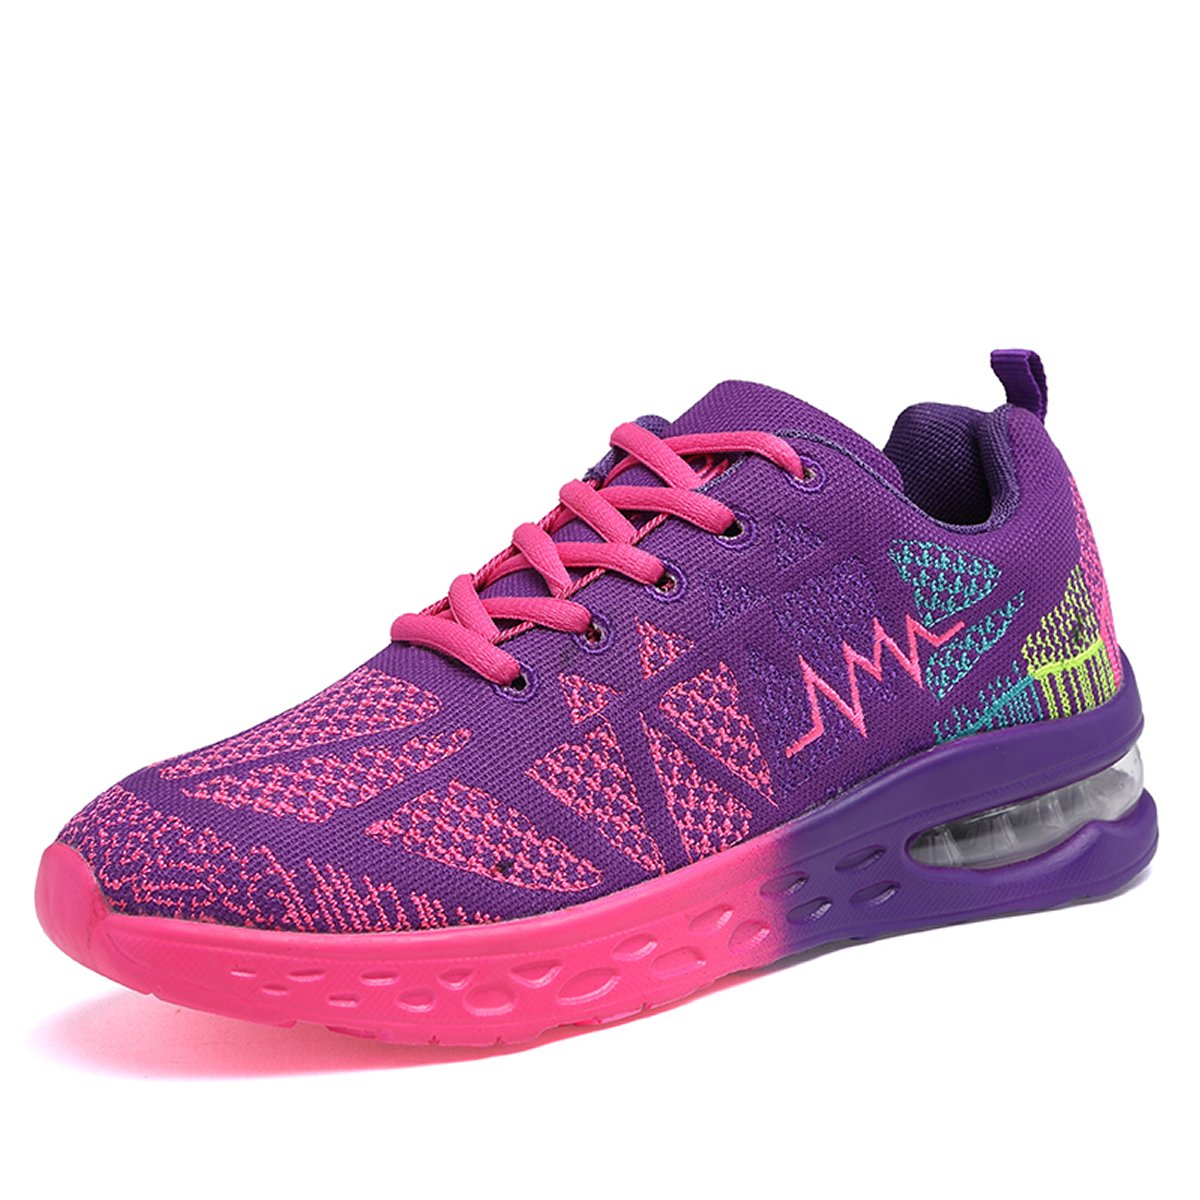 JARLIF Women's Athletic Running Sneakers Fashion Sport Air Fitness Workout Gym Jogging Walking Shoes US5.5-10 B0719C6R4M 8.5 B(M) US|Purple